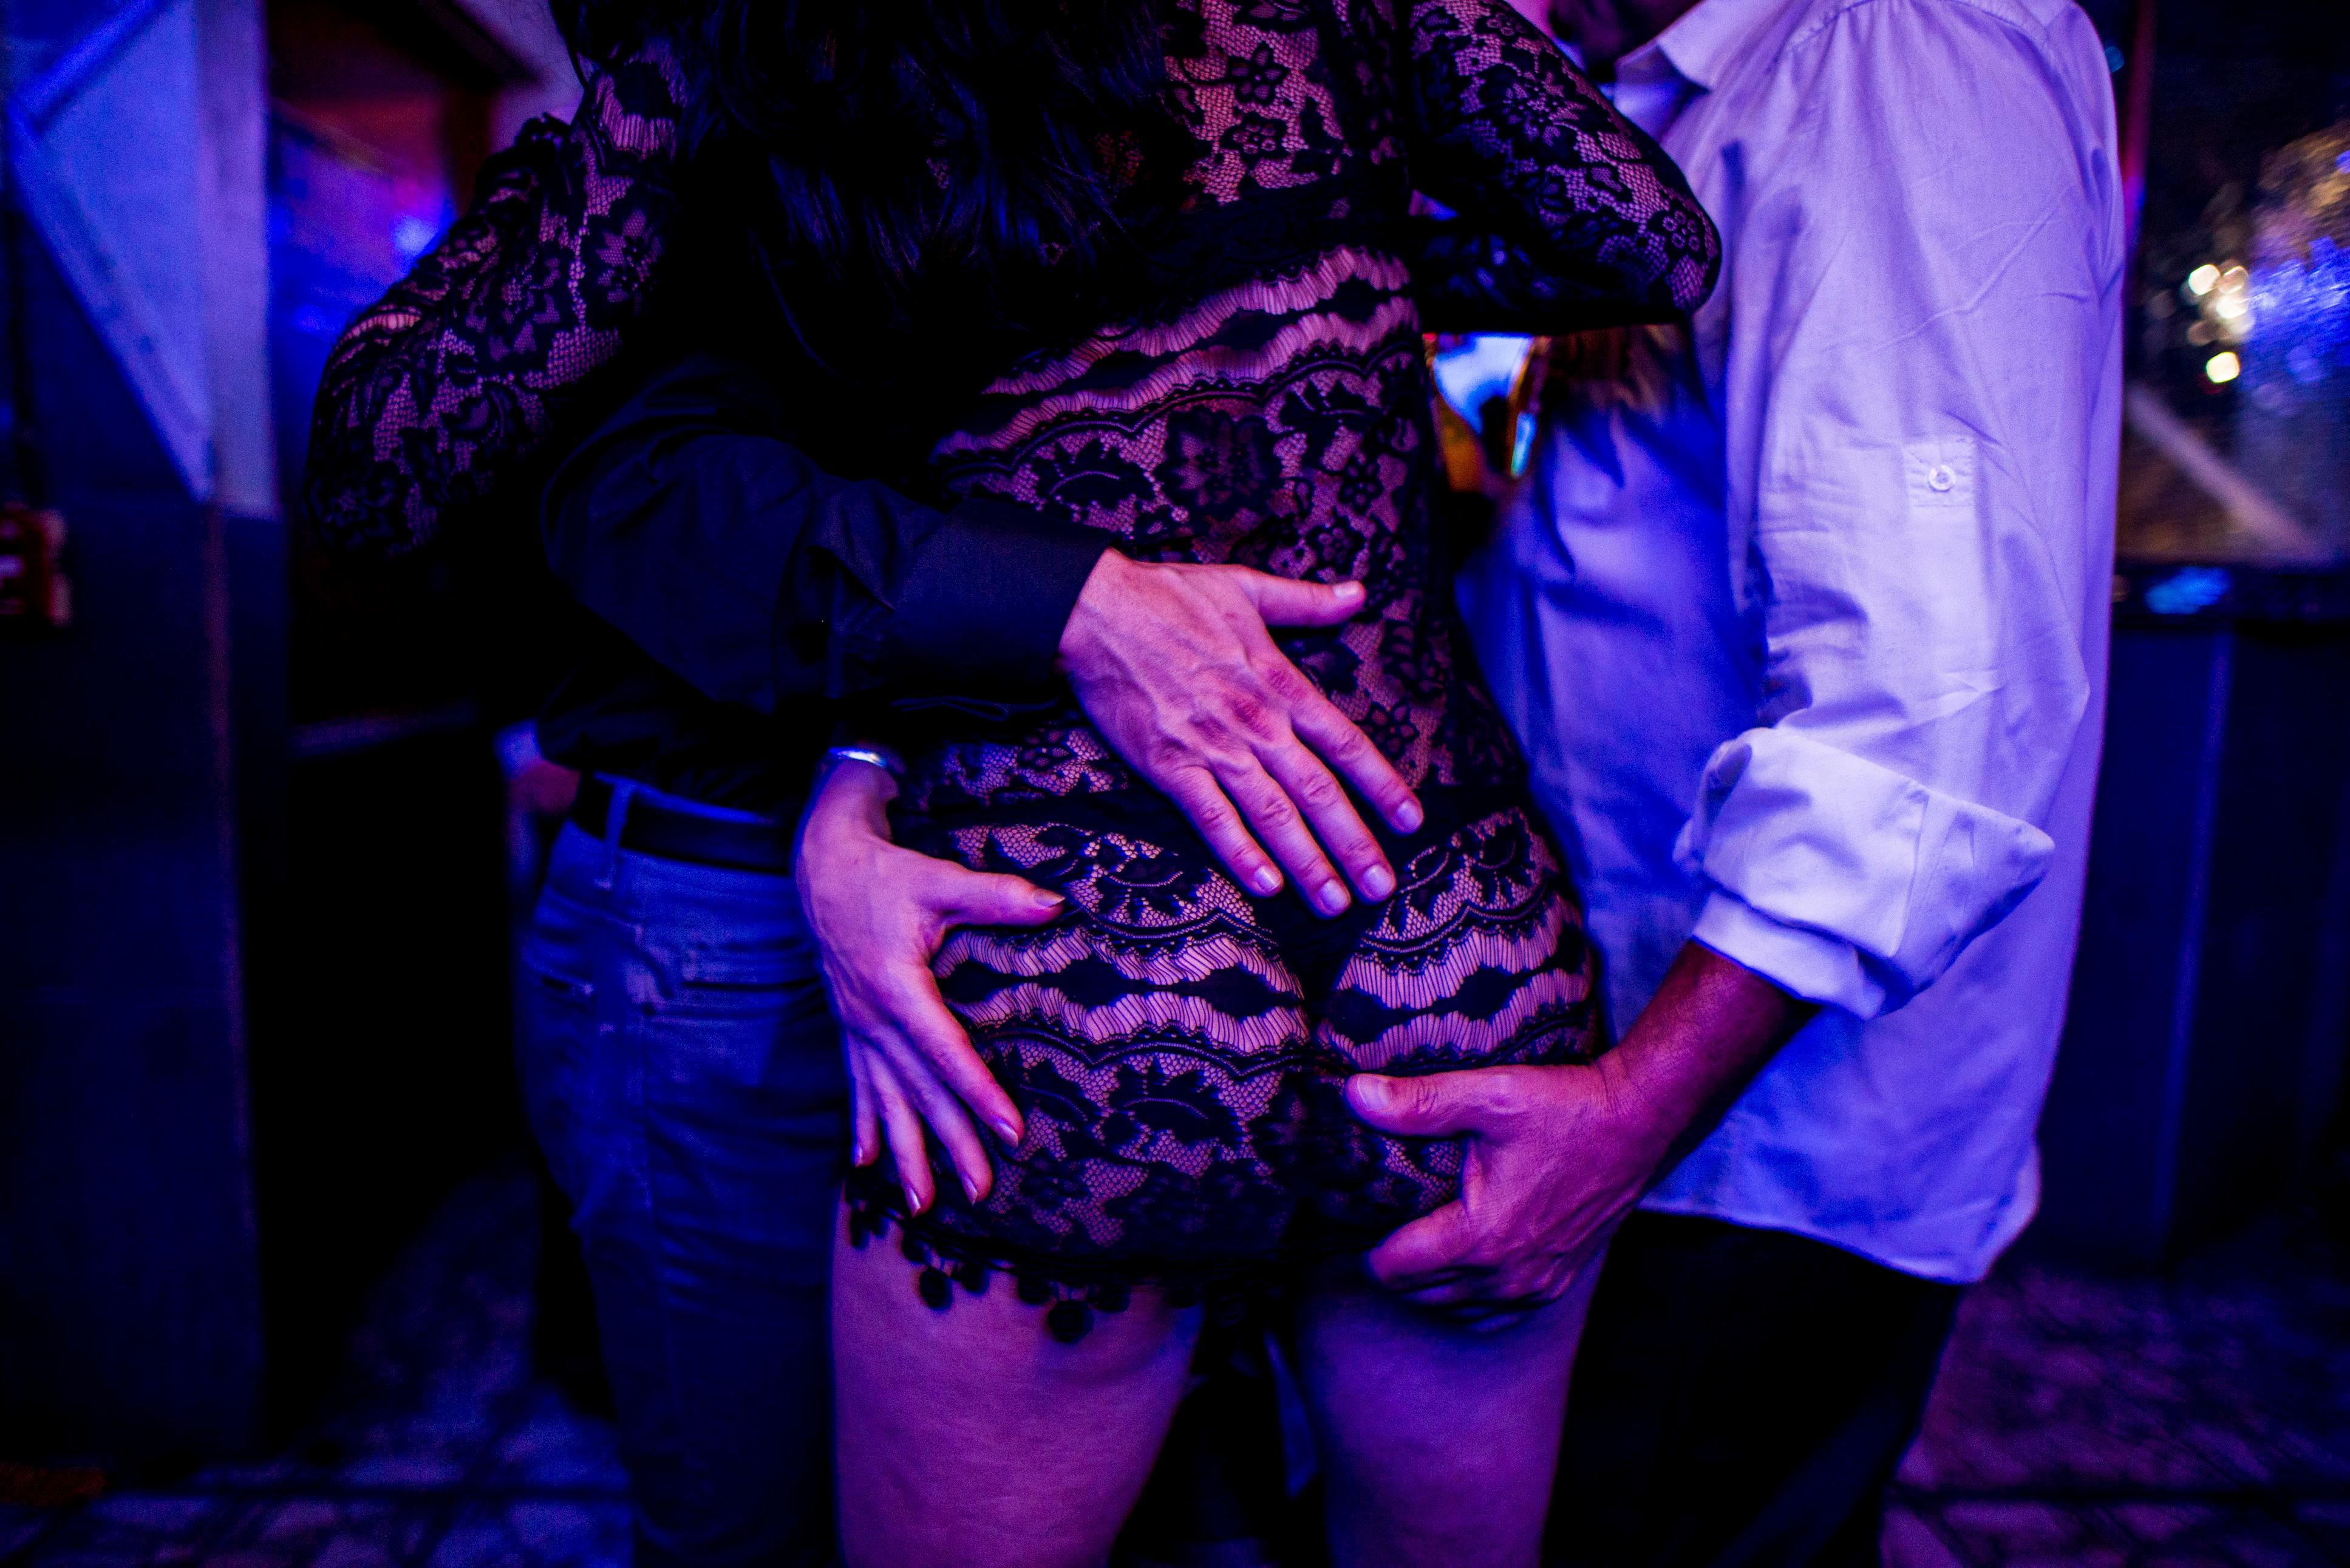 оргий в ночных клубах фото